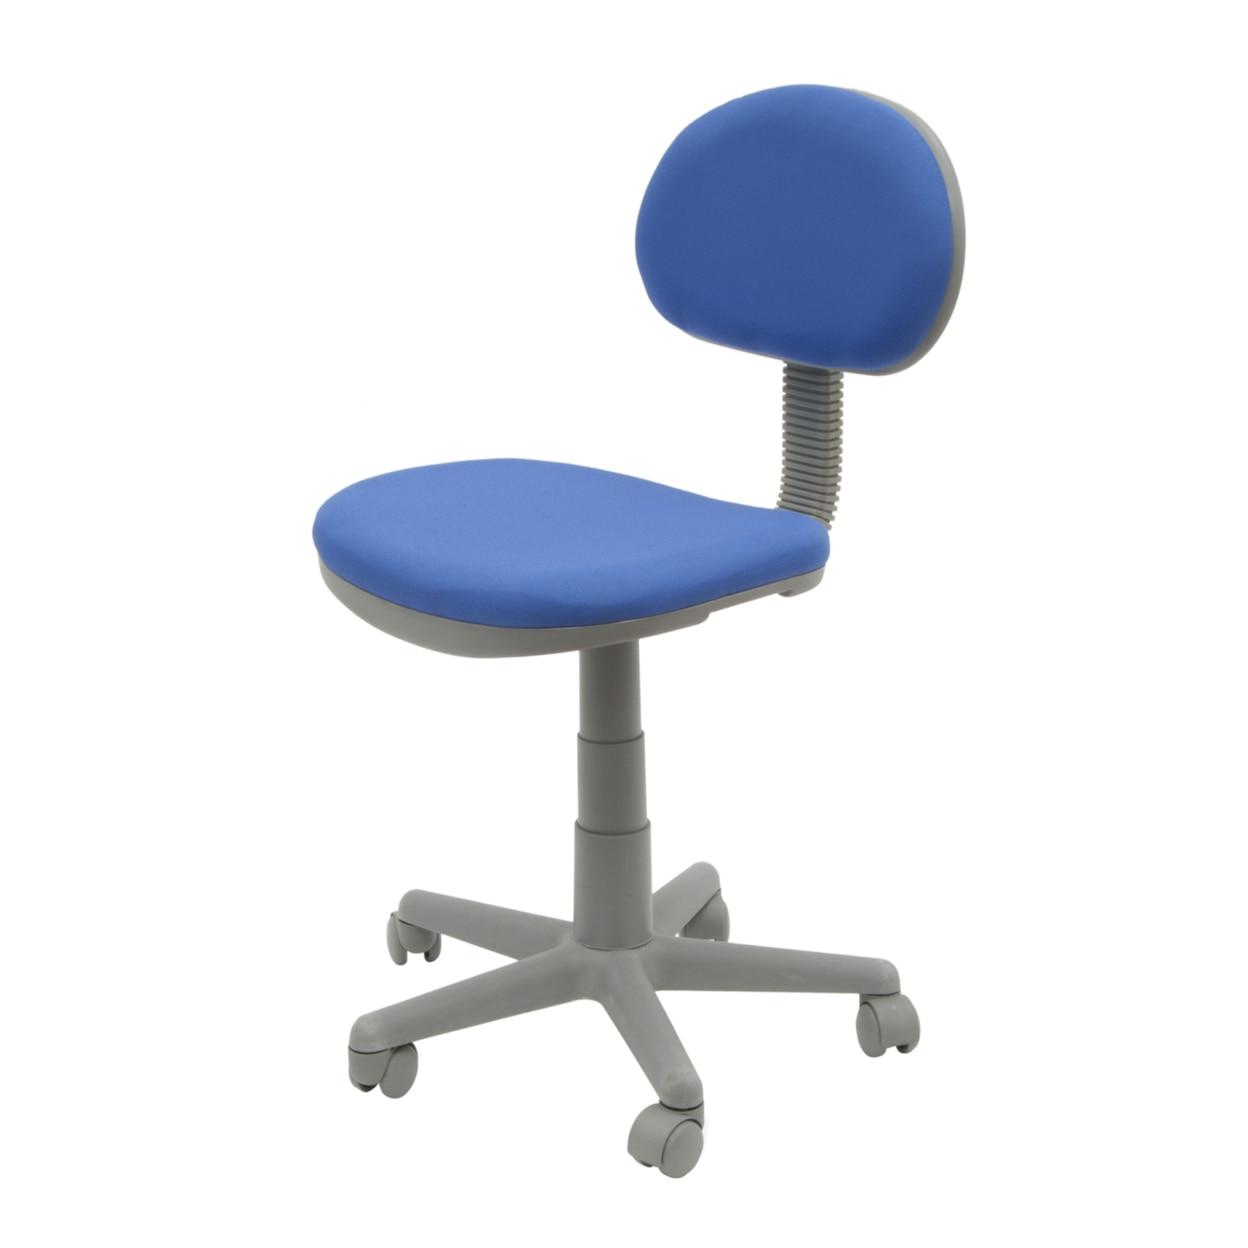 Studio Designs Home Office Deluxe Task Chair - Blue/Gray игрушка ecx ruckus gray blue ecx00013t1